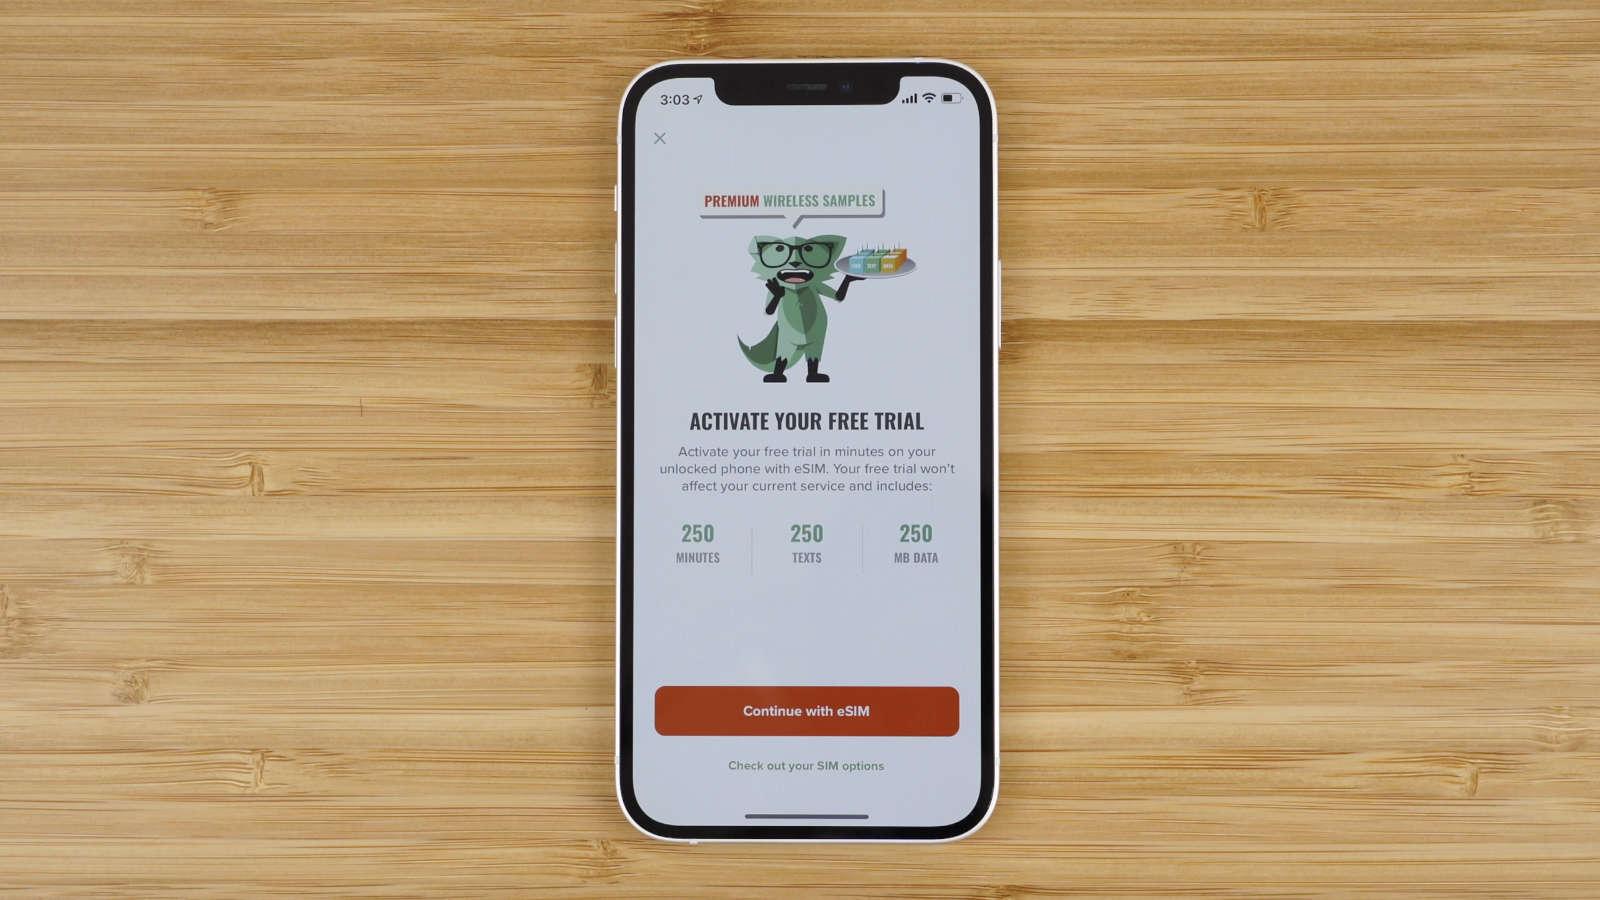 Mint Mobile free trial app screen